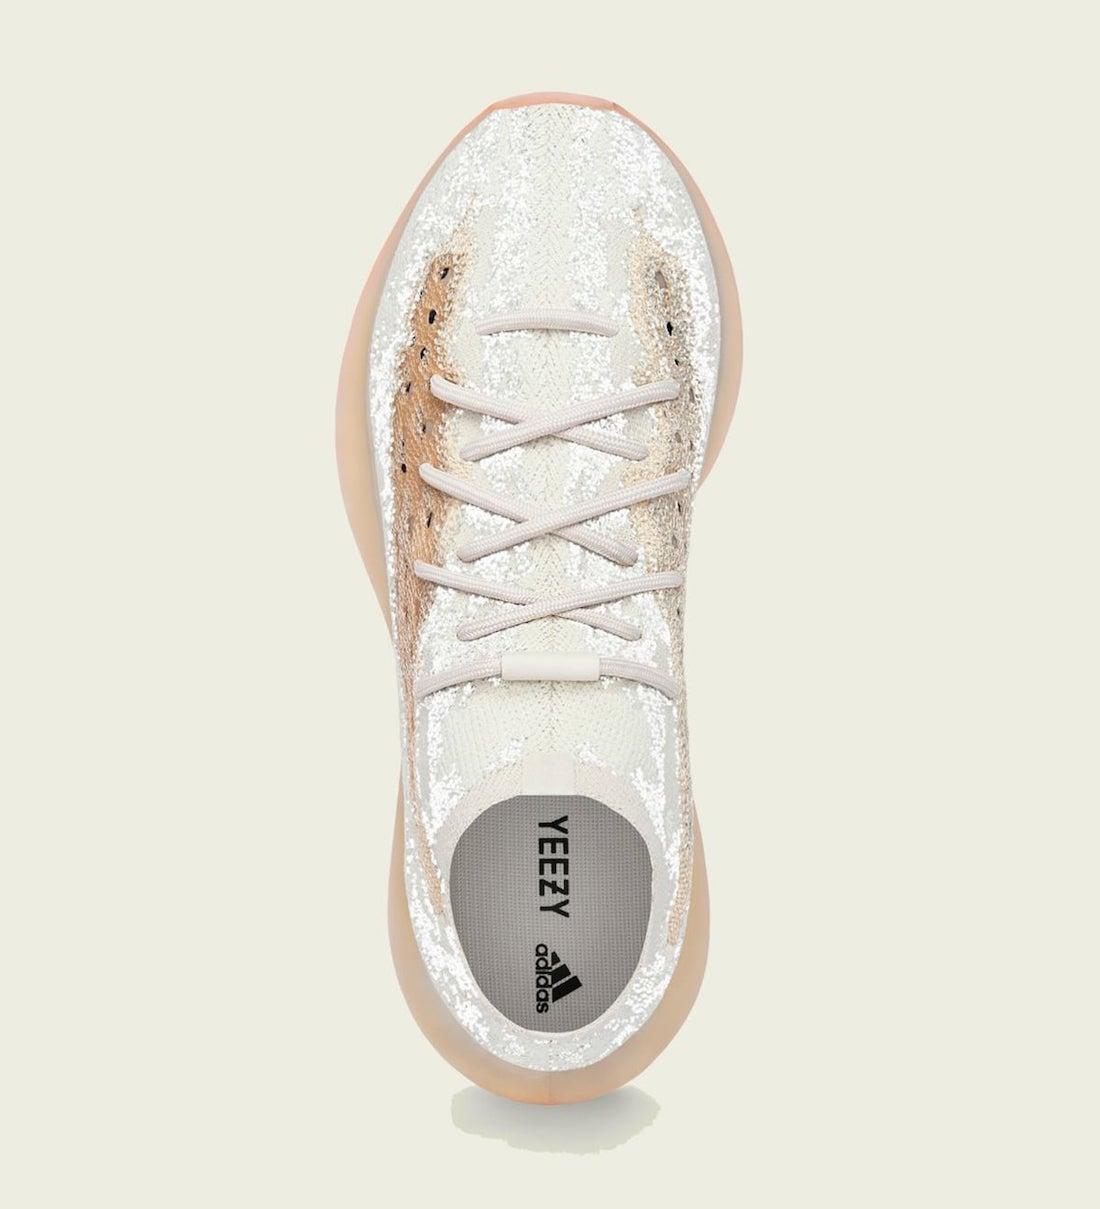 adidas-Yeezy-Boost-380-Yecoraite-GY2649-Release-Date-3